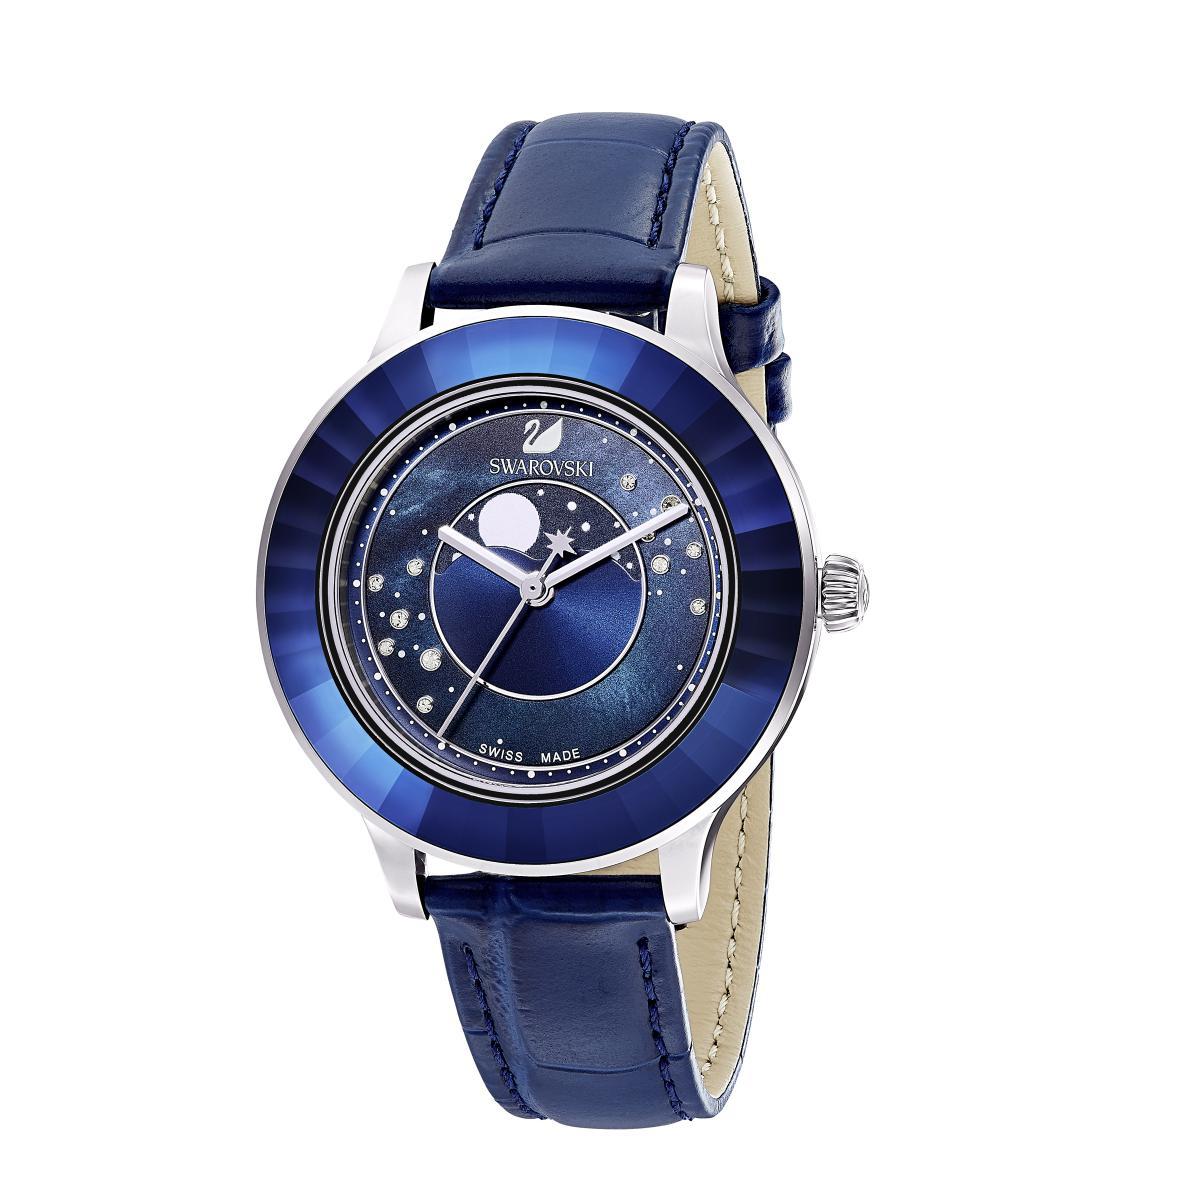 Montre Swarovski 5516305 - Octea Lux Cadran Phase Lune Bracelet Cuir Lunette Cristal Dark Indigo - Swarovski montres - Modalova